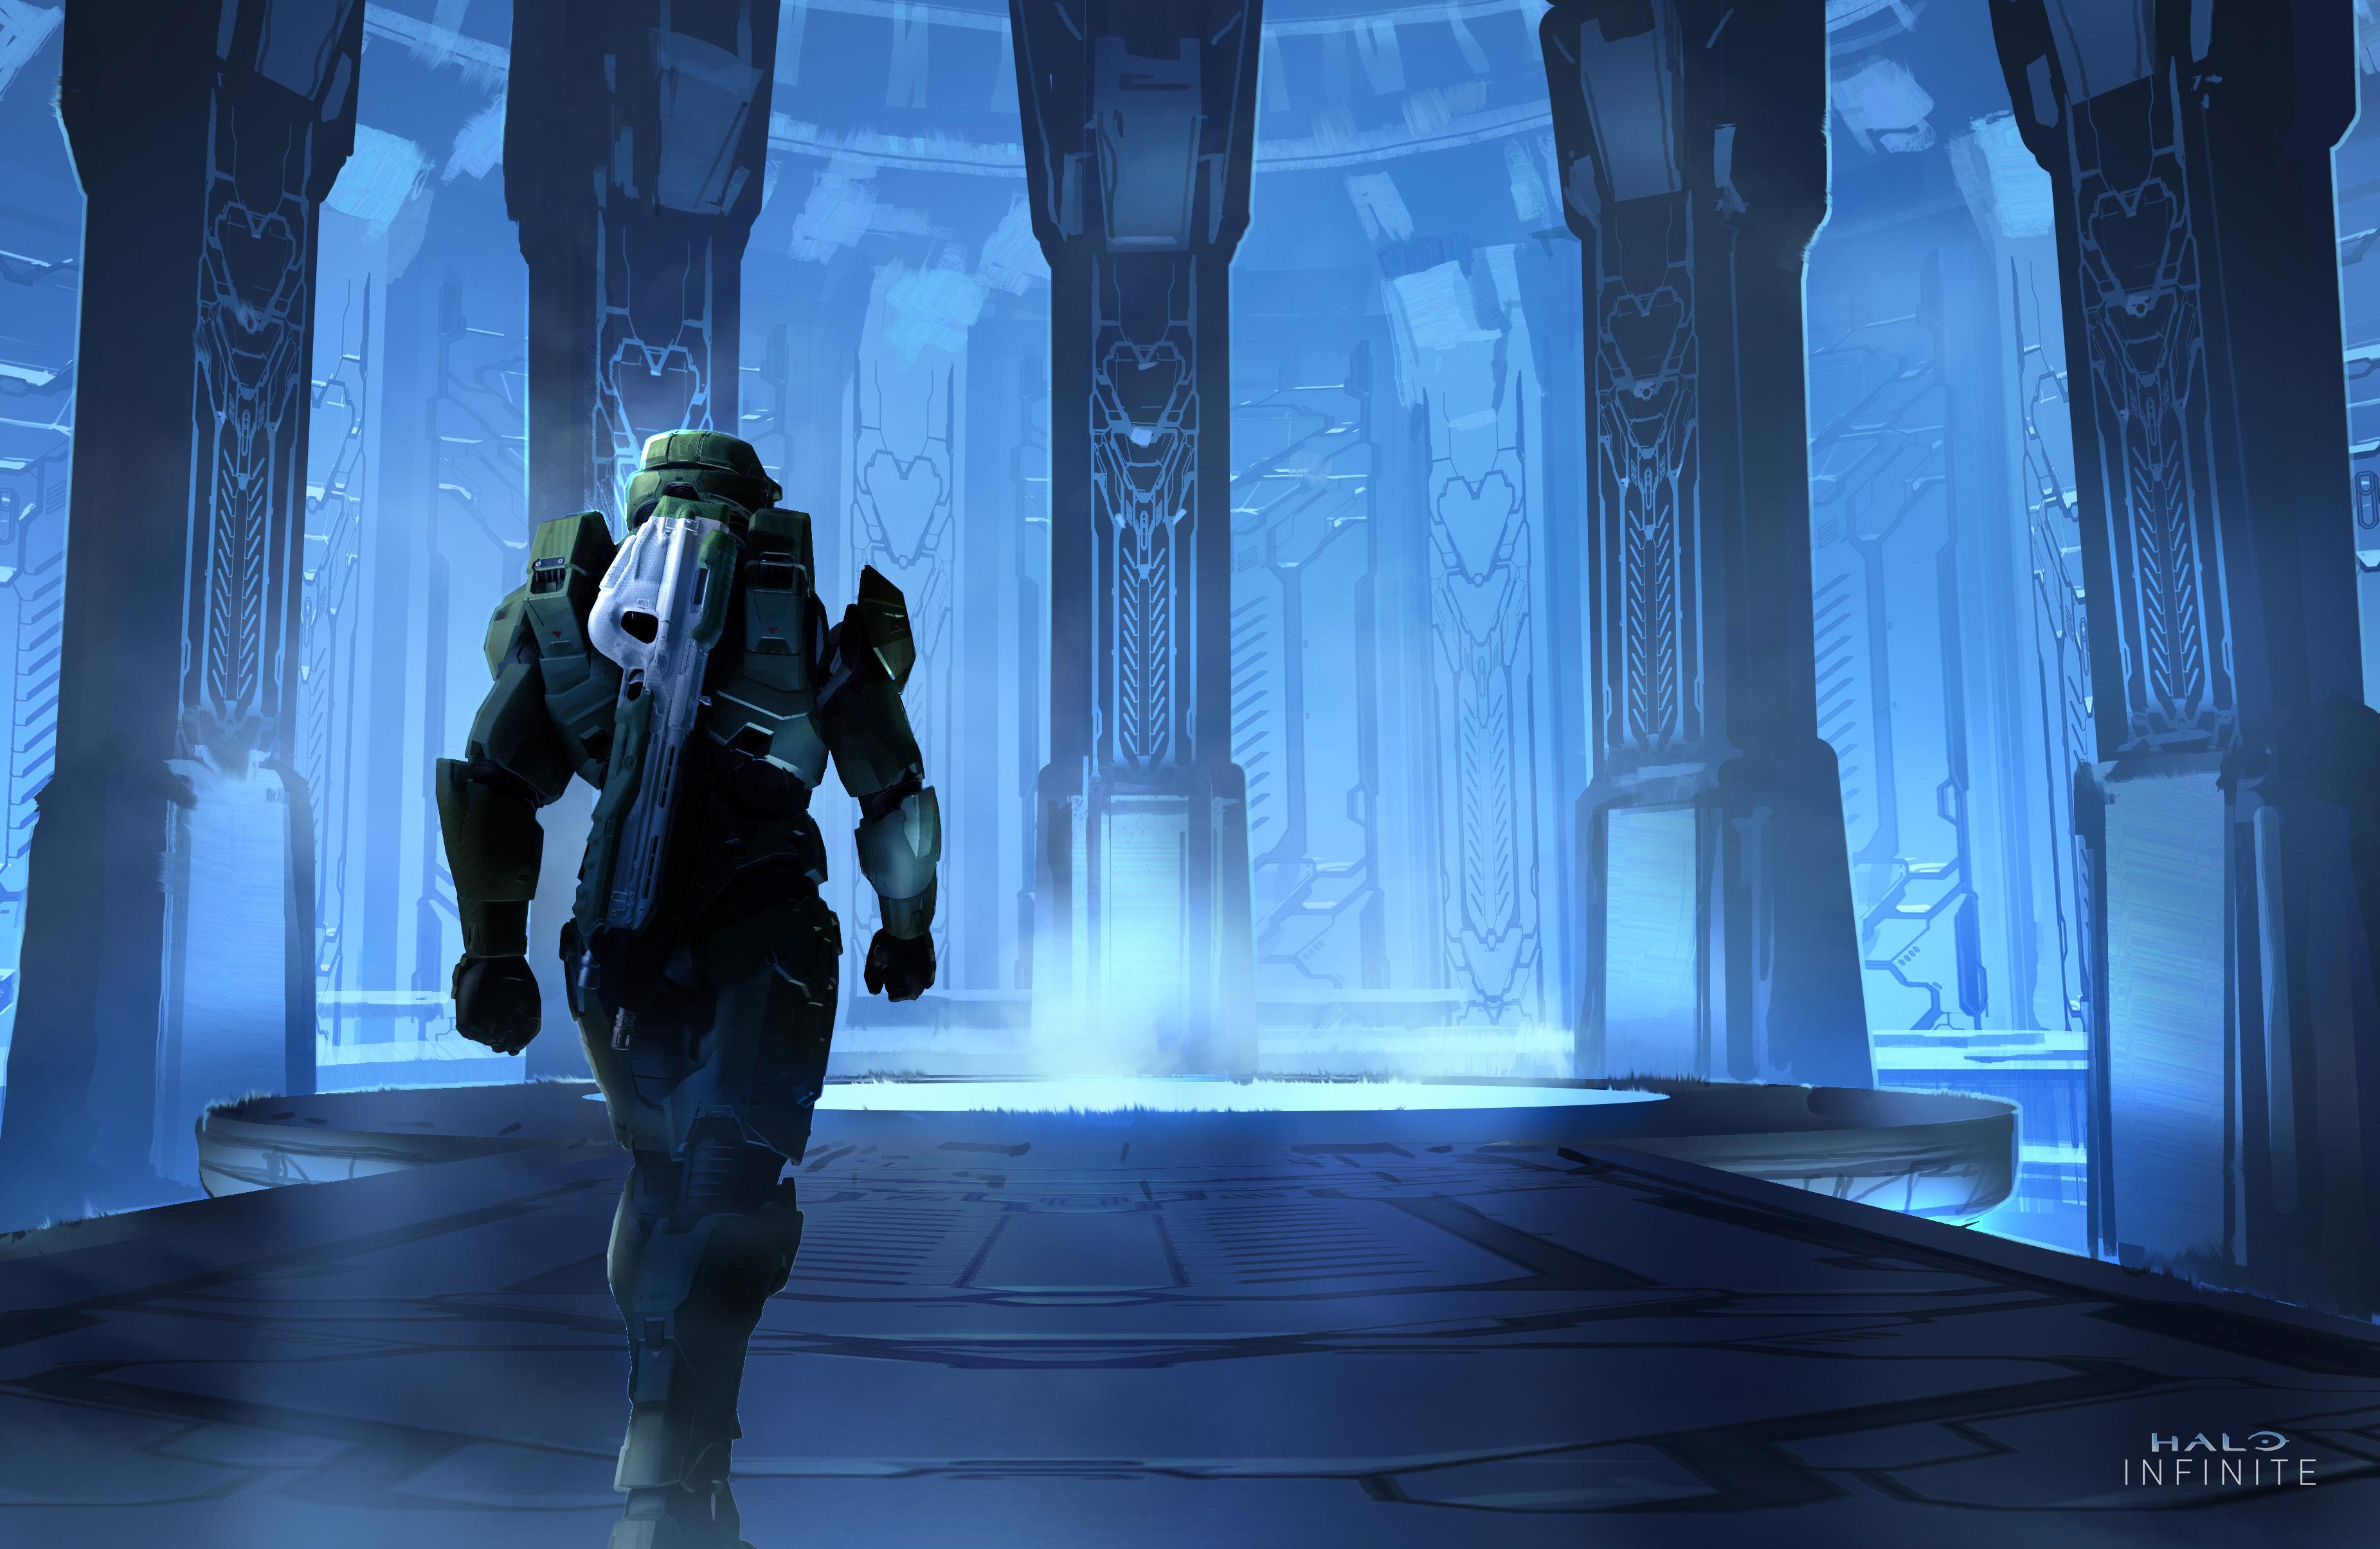 Trailer Transmissions Halo Community Update Halo